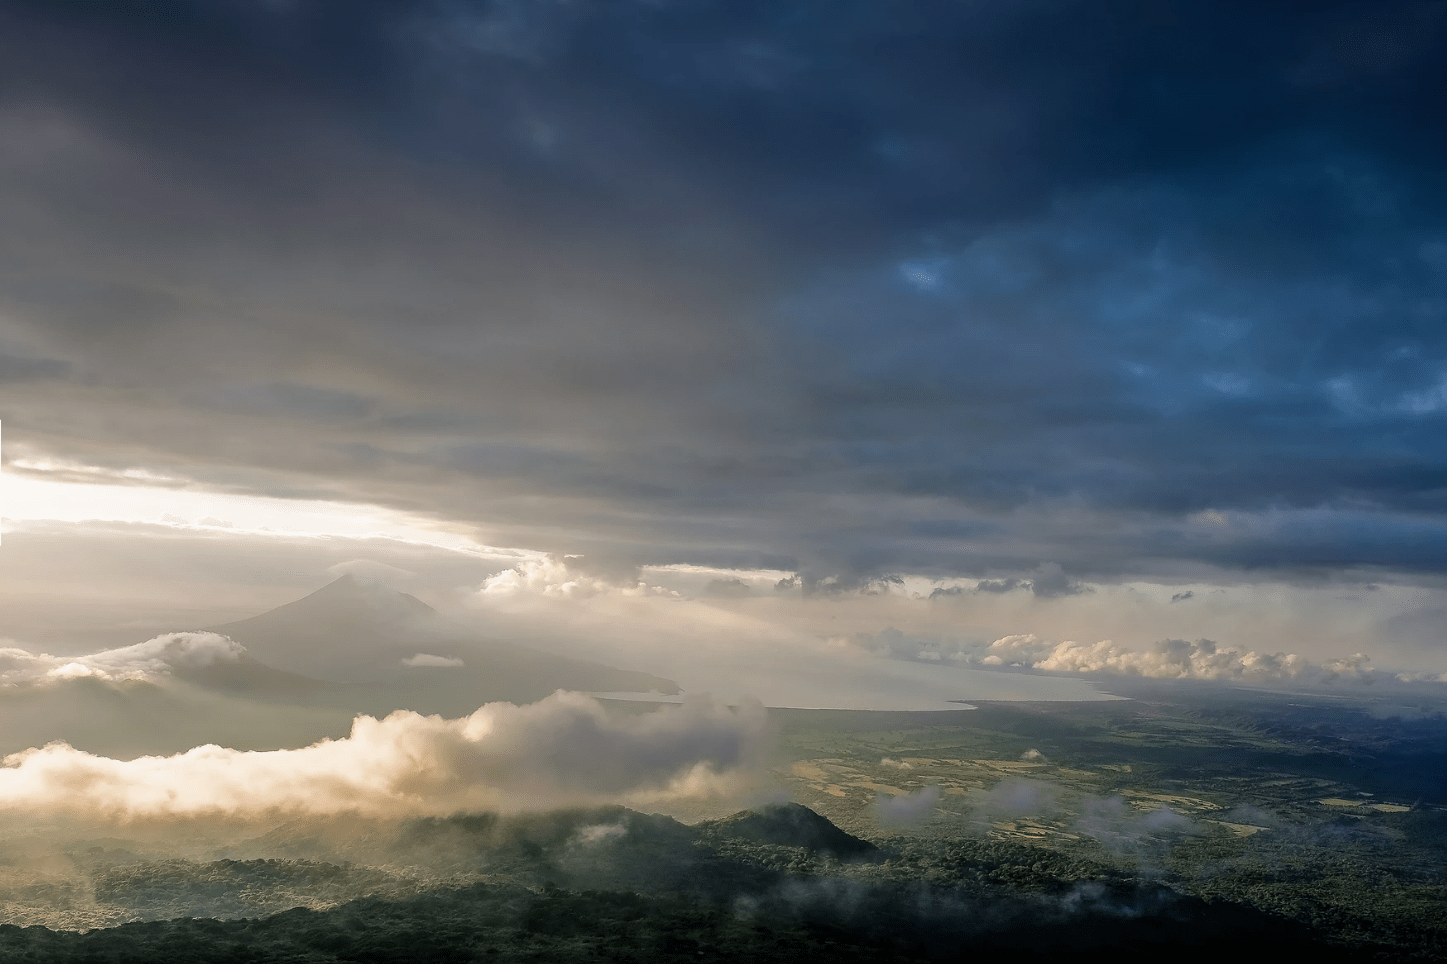 El gran angular da amplitud para fotos de paisaje